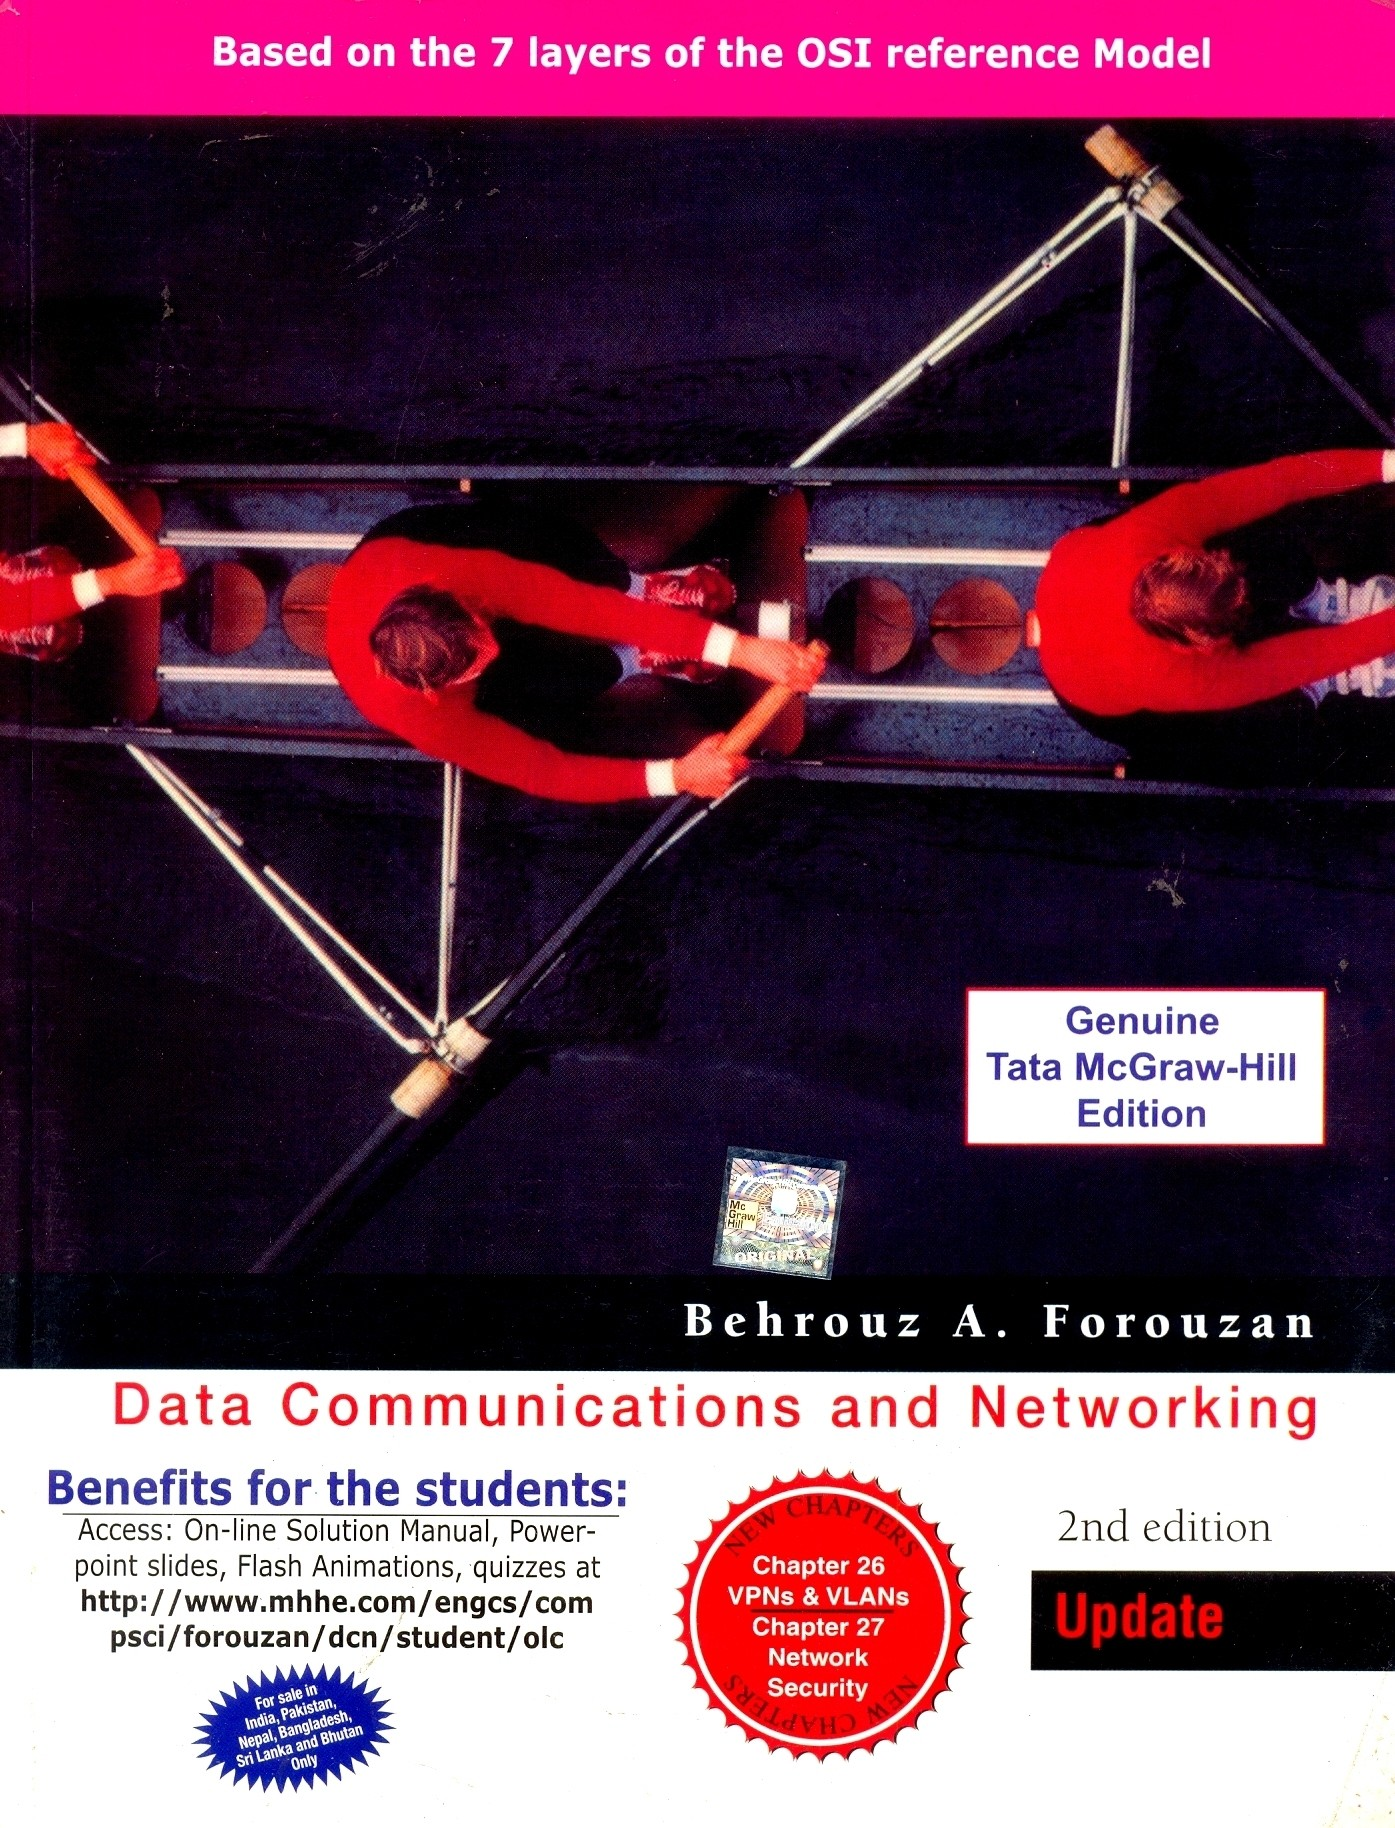 data communications and networking Data communications and networking, 5th edition ebook: behrouz forouzan: amazoncomau: kindle store.